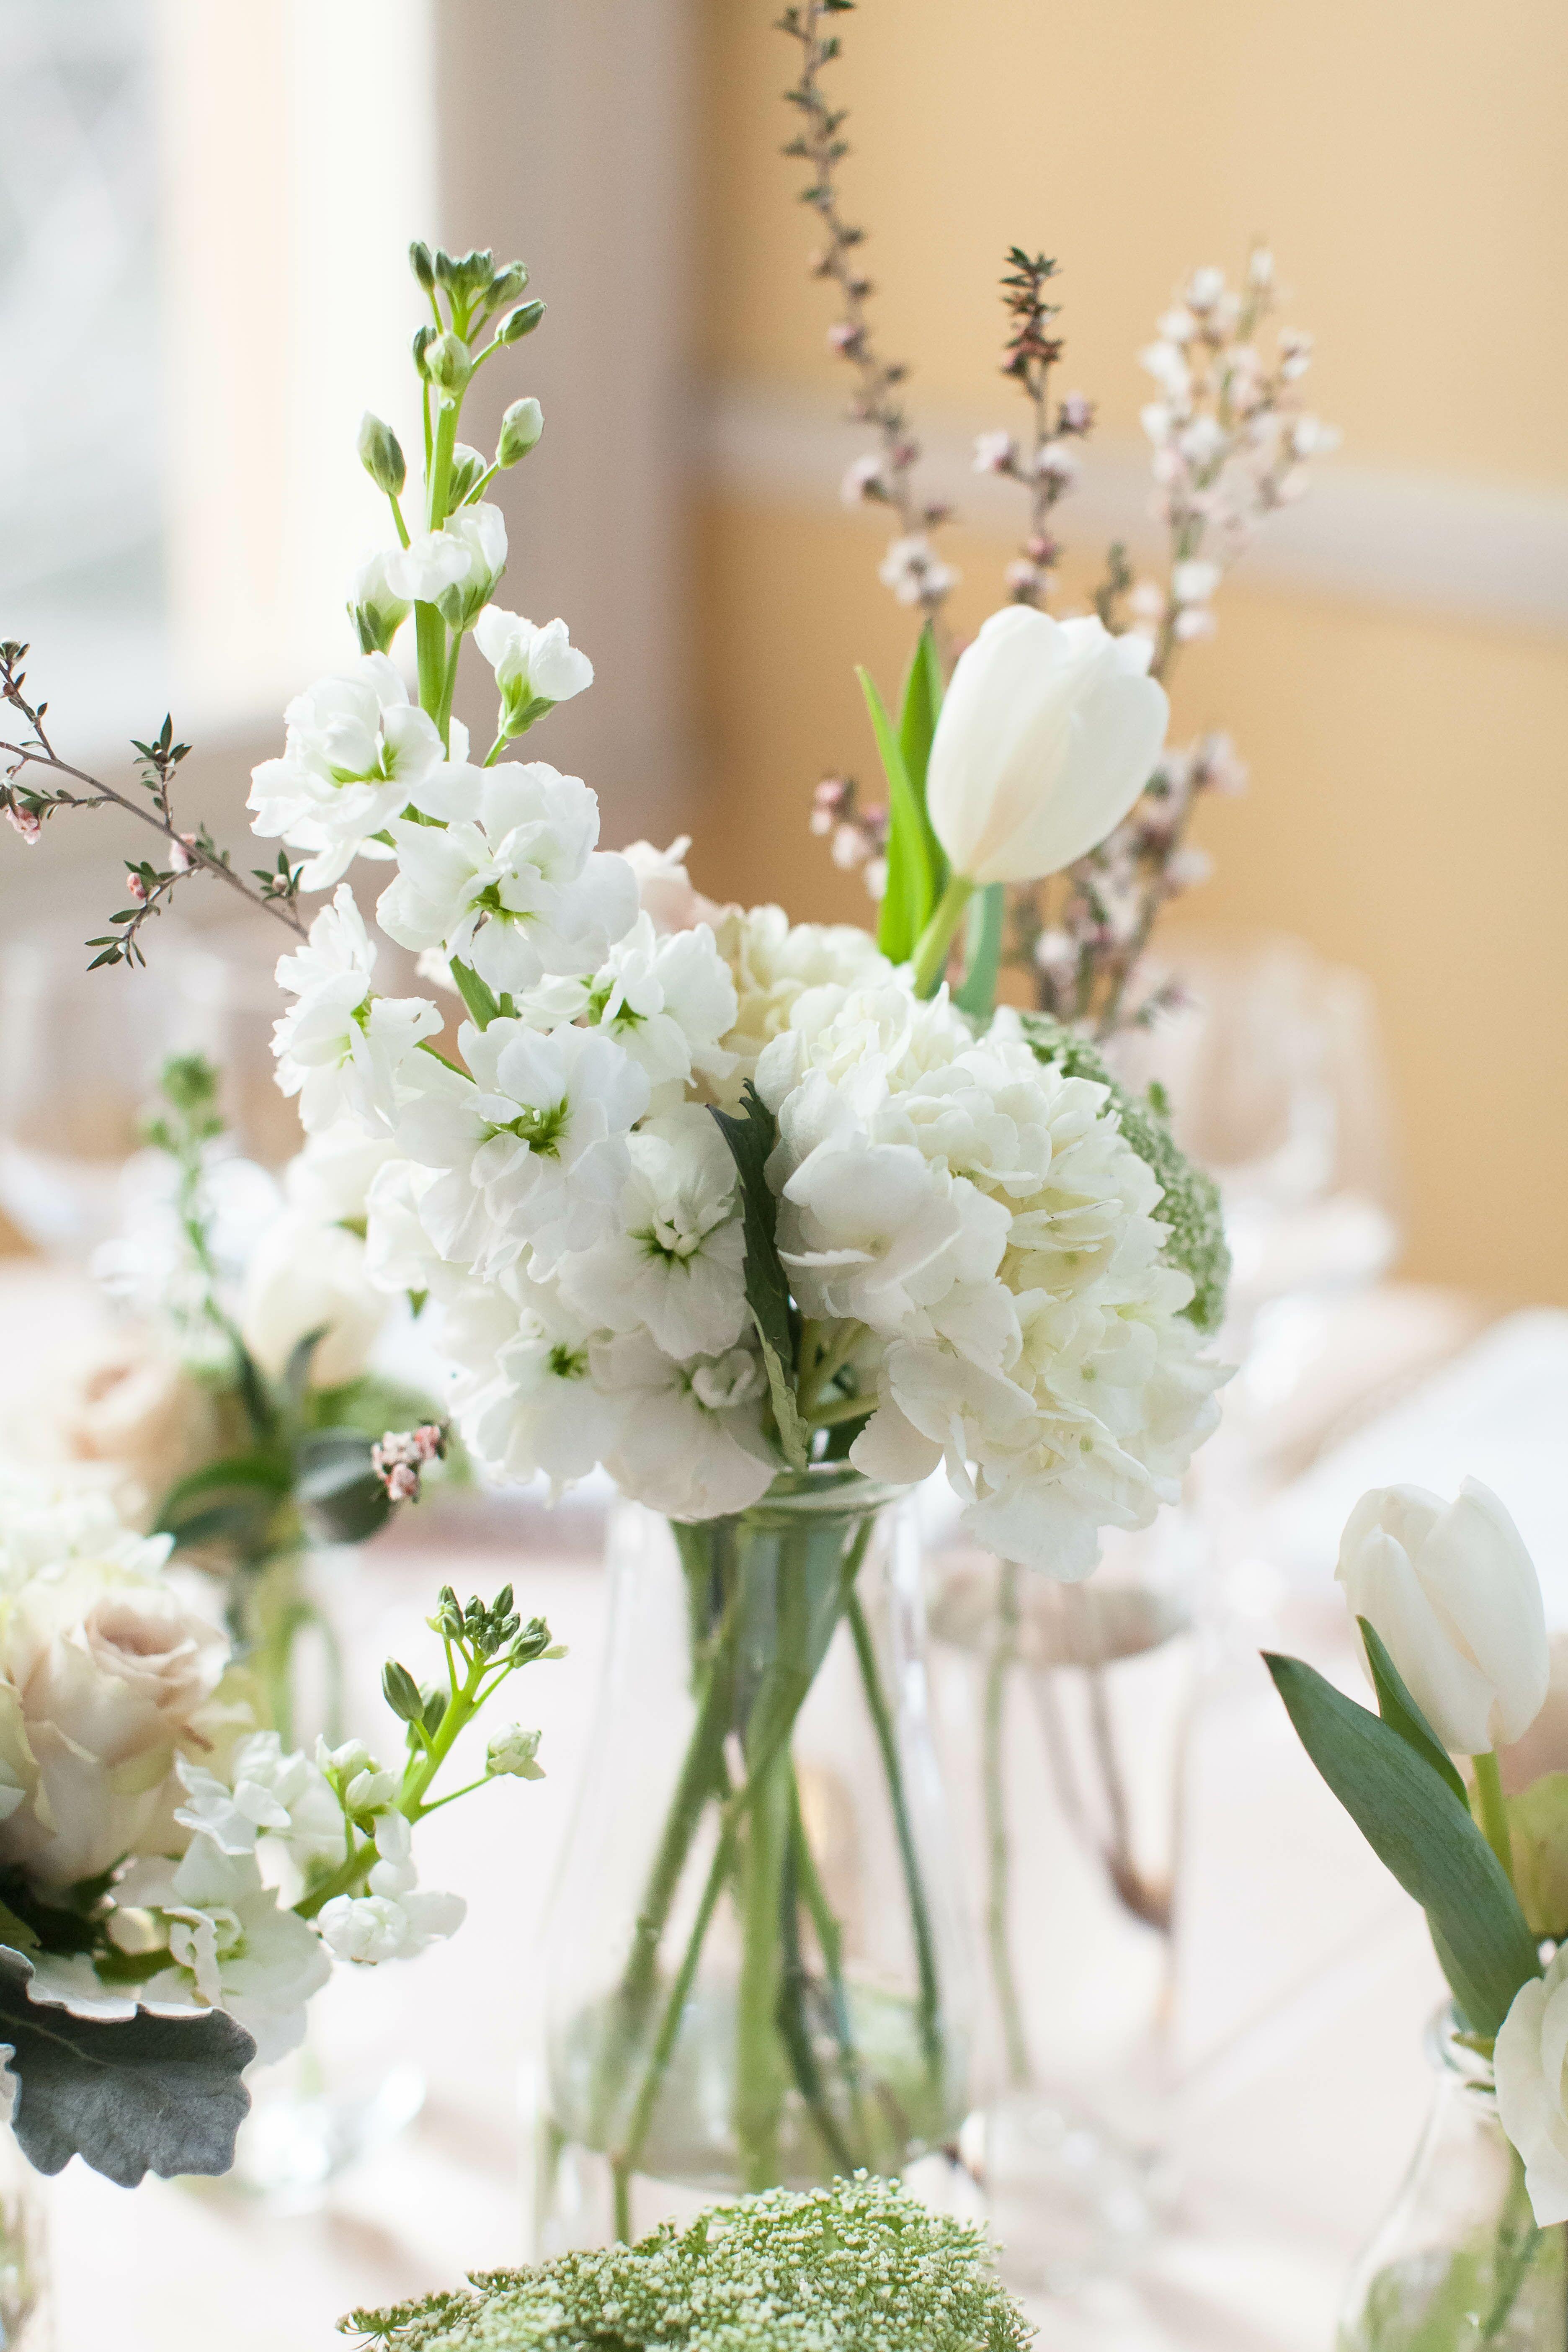 White hydrangea and tulip centerpieces